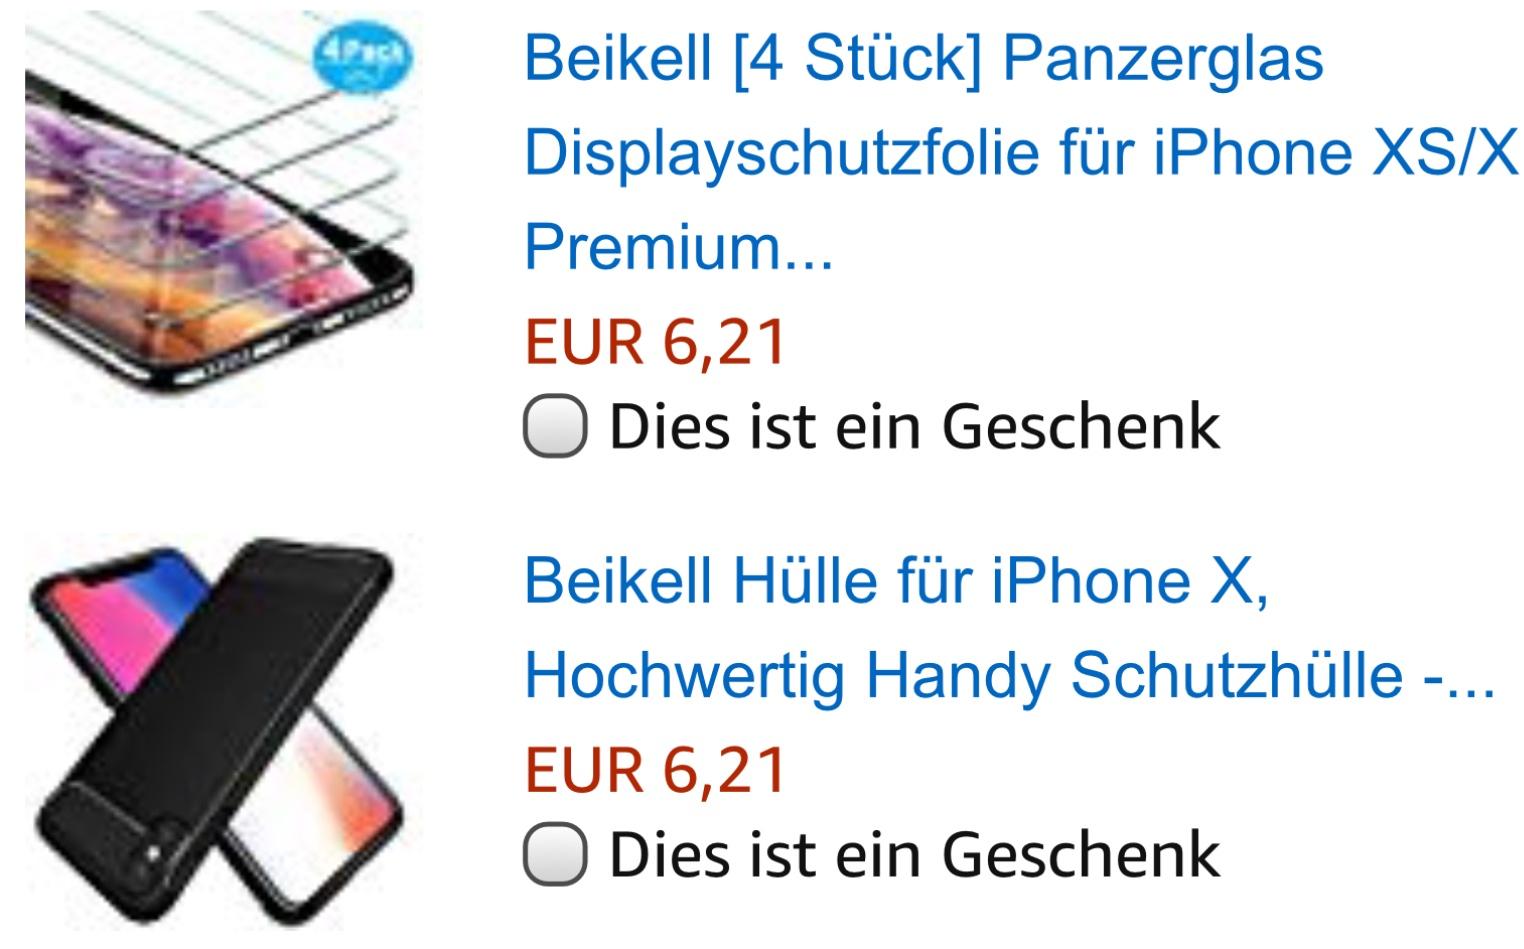 [Amazon Prime] iPhone X BEIKELL 4x Panzerglas Folien plus schw. TPU Case